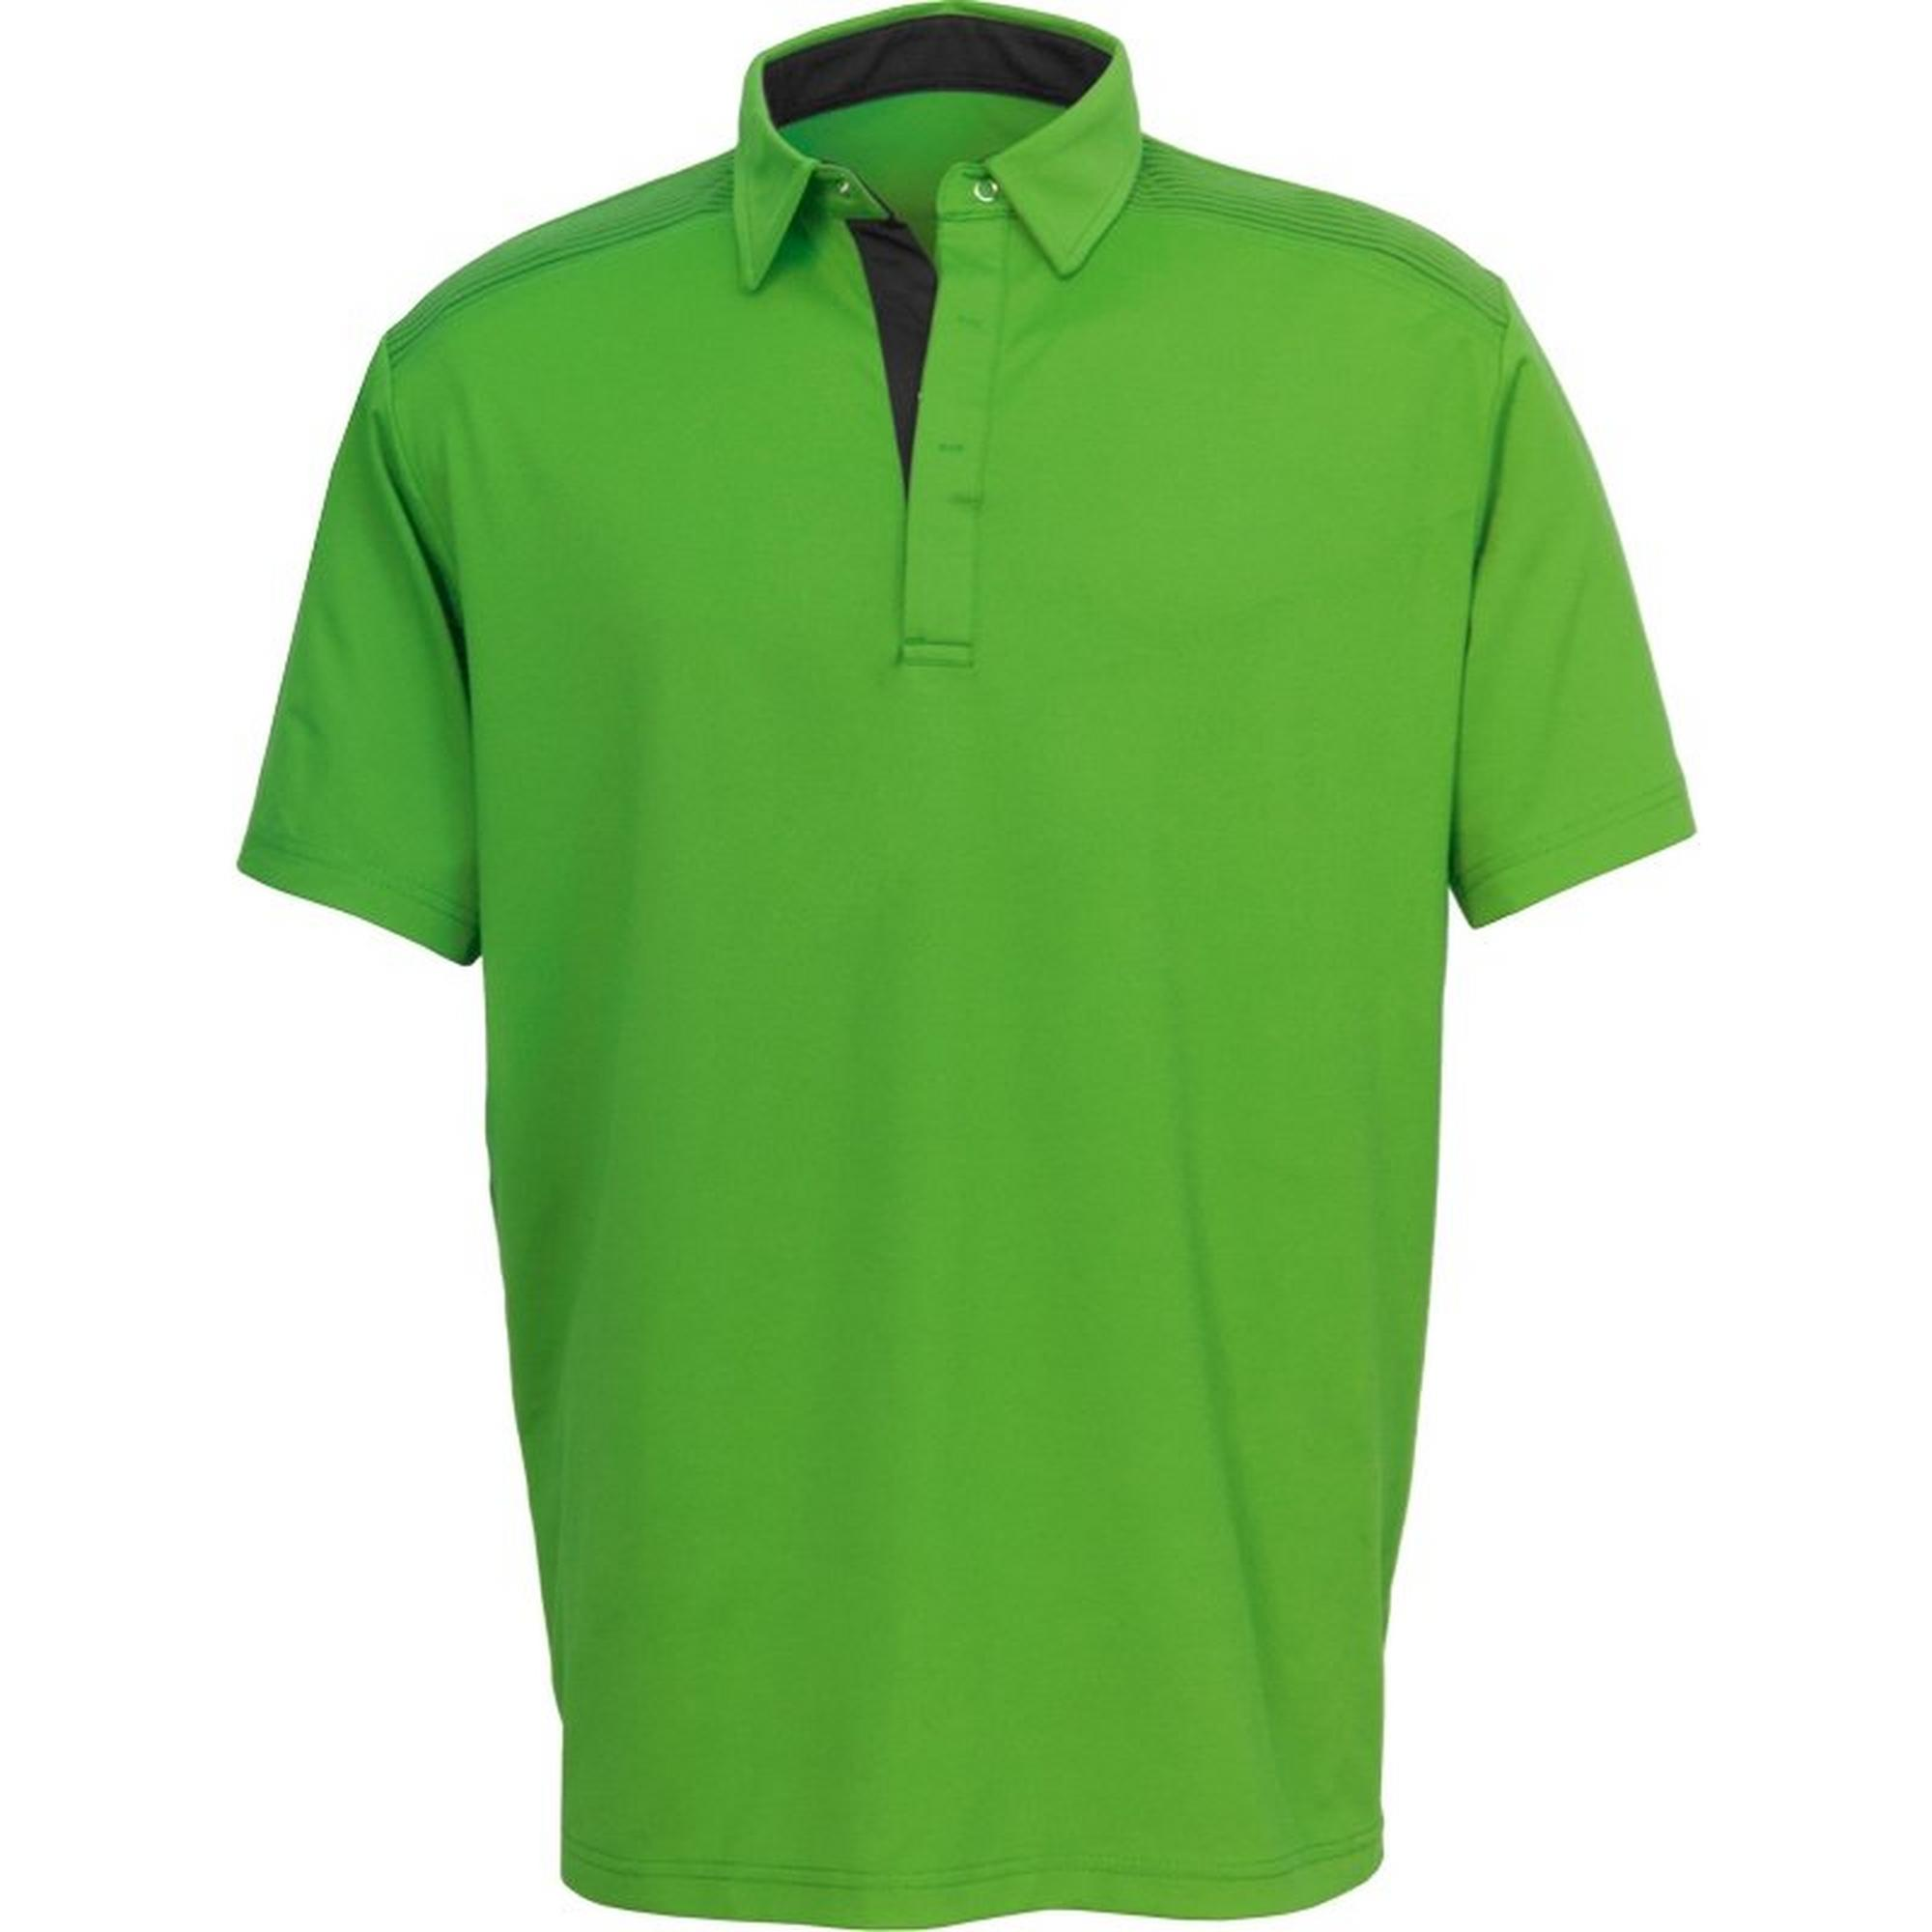 Men's Onyx Short Sleeve Polo